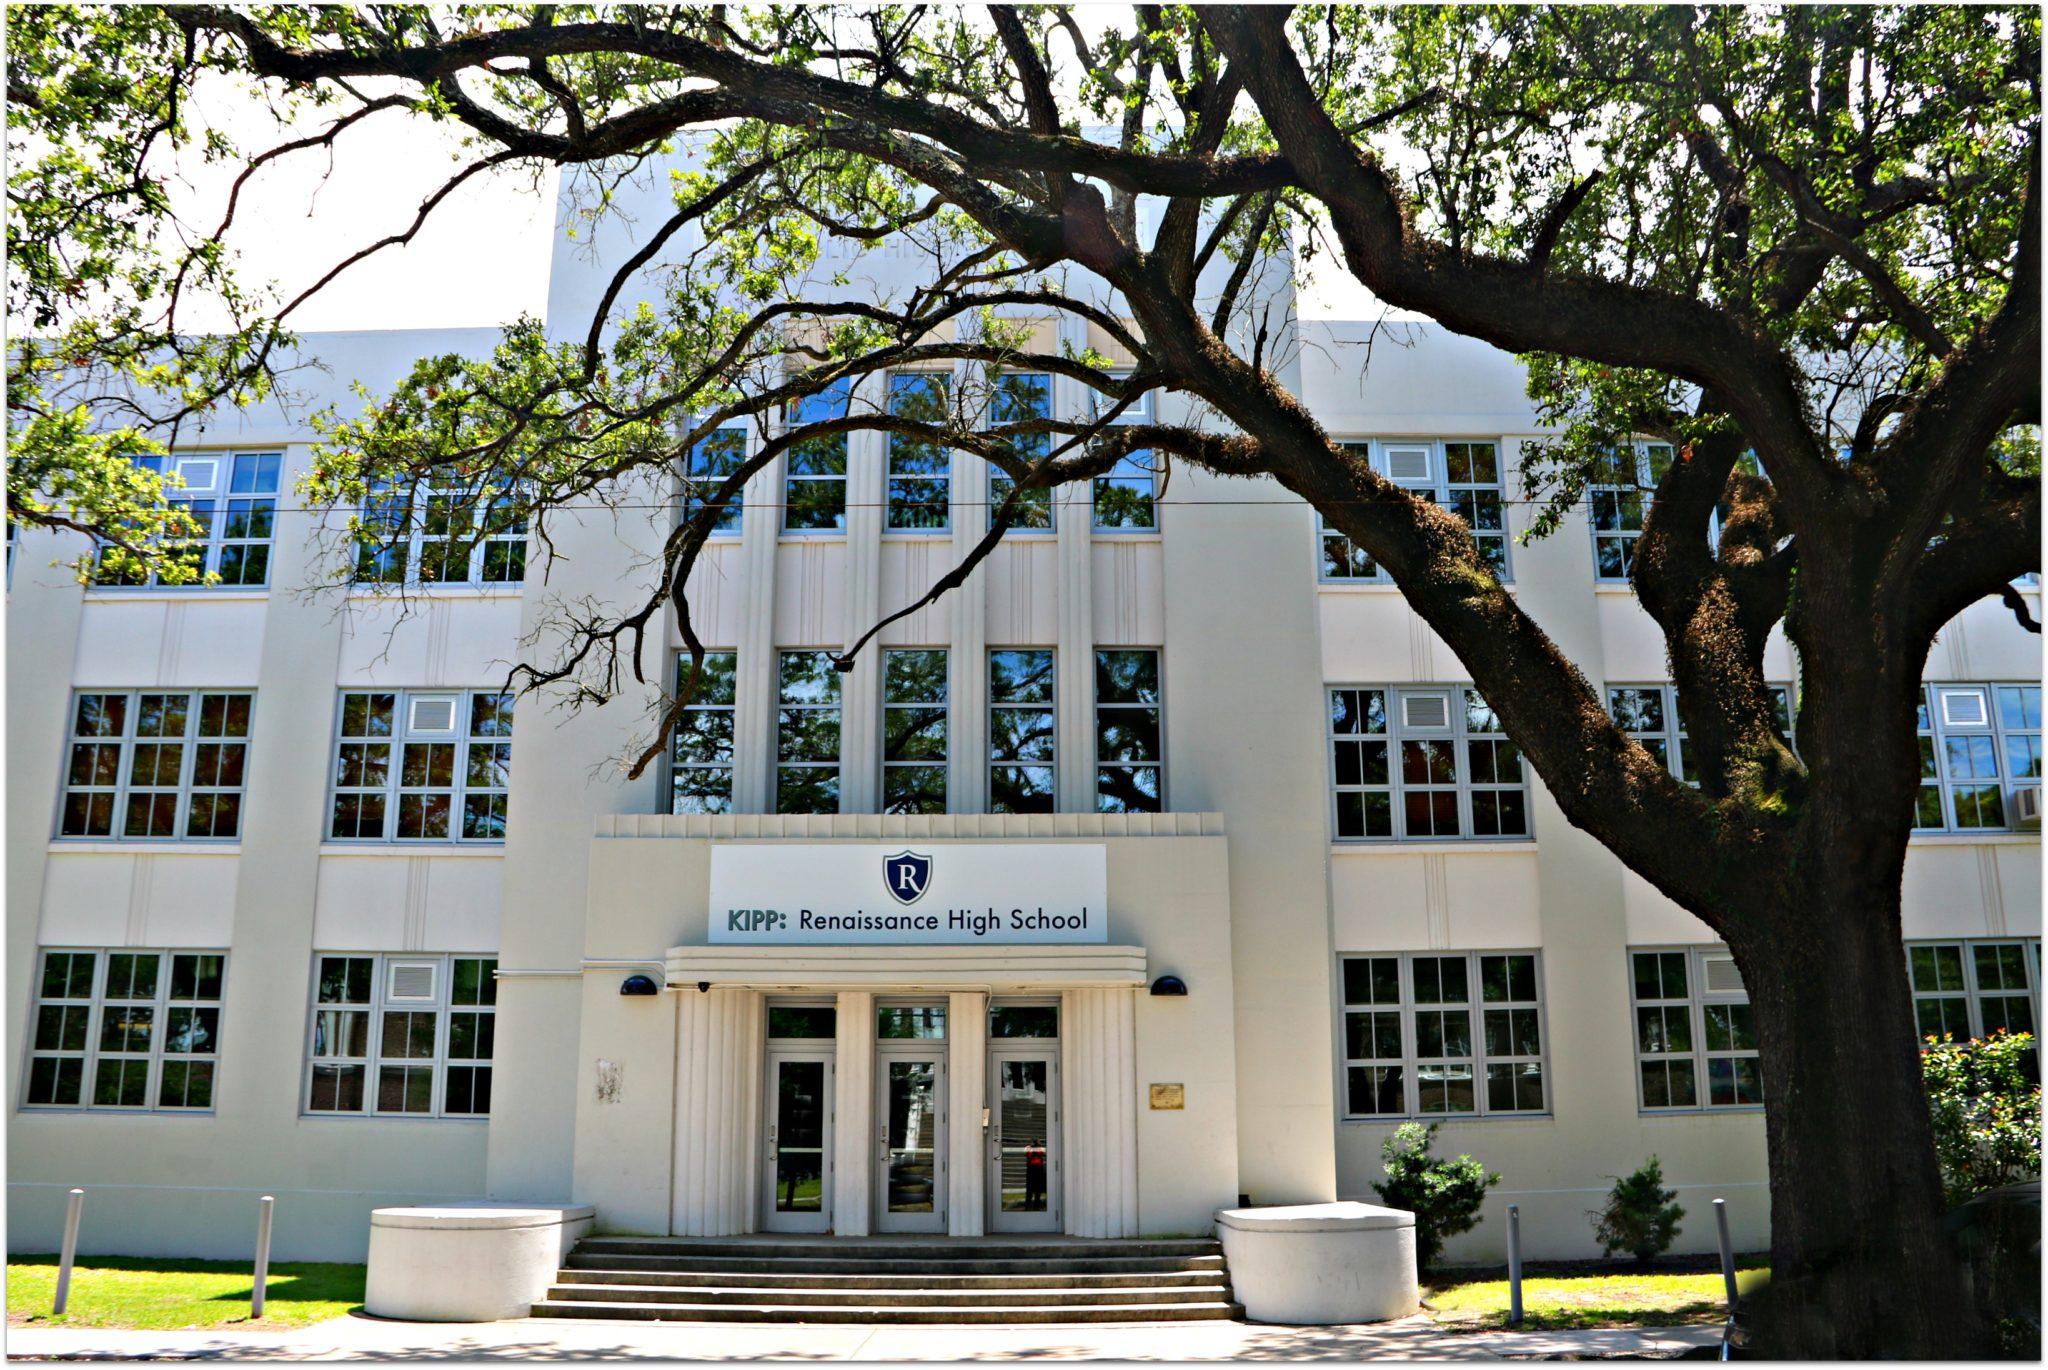 Fraancis T. Nicholls High School on St. Claude Avenue